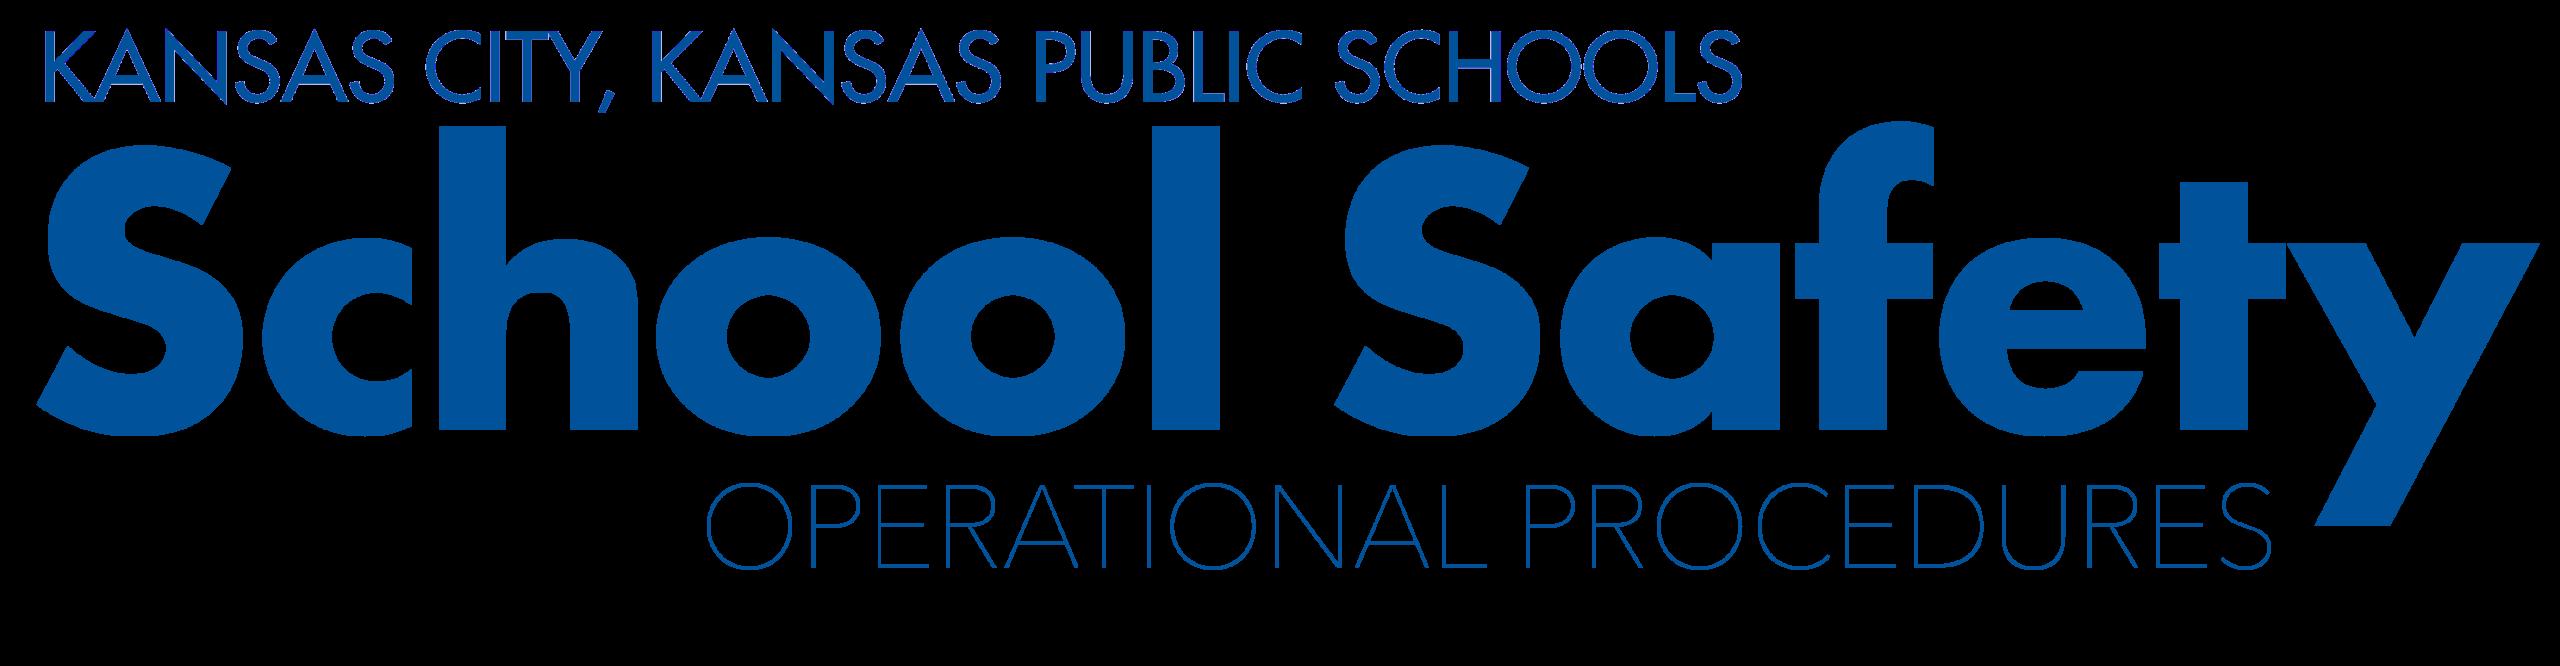 School Safety Operational Procedures